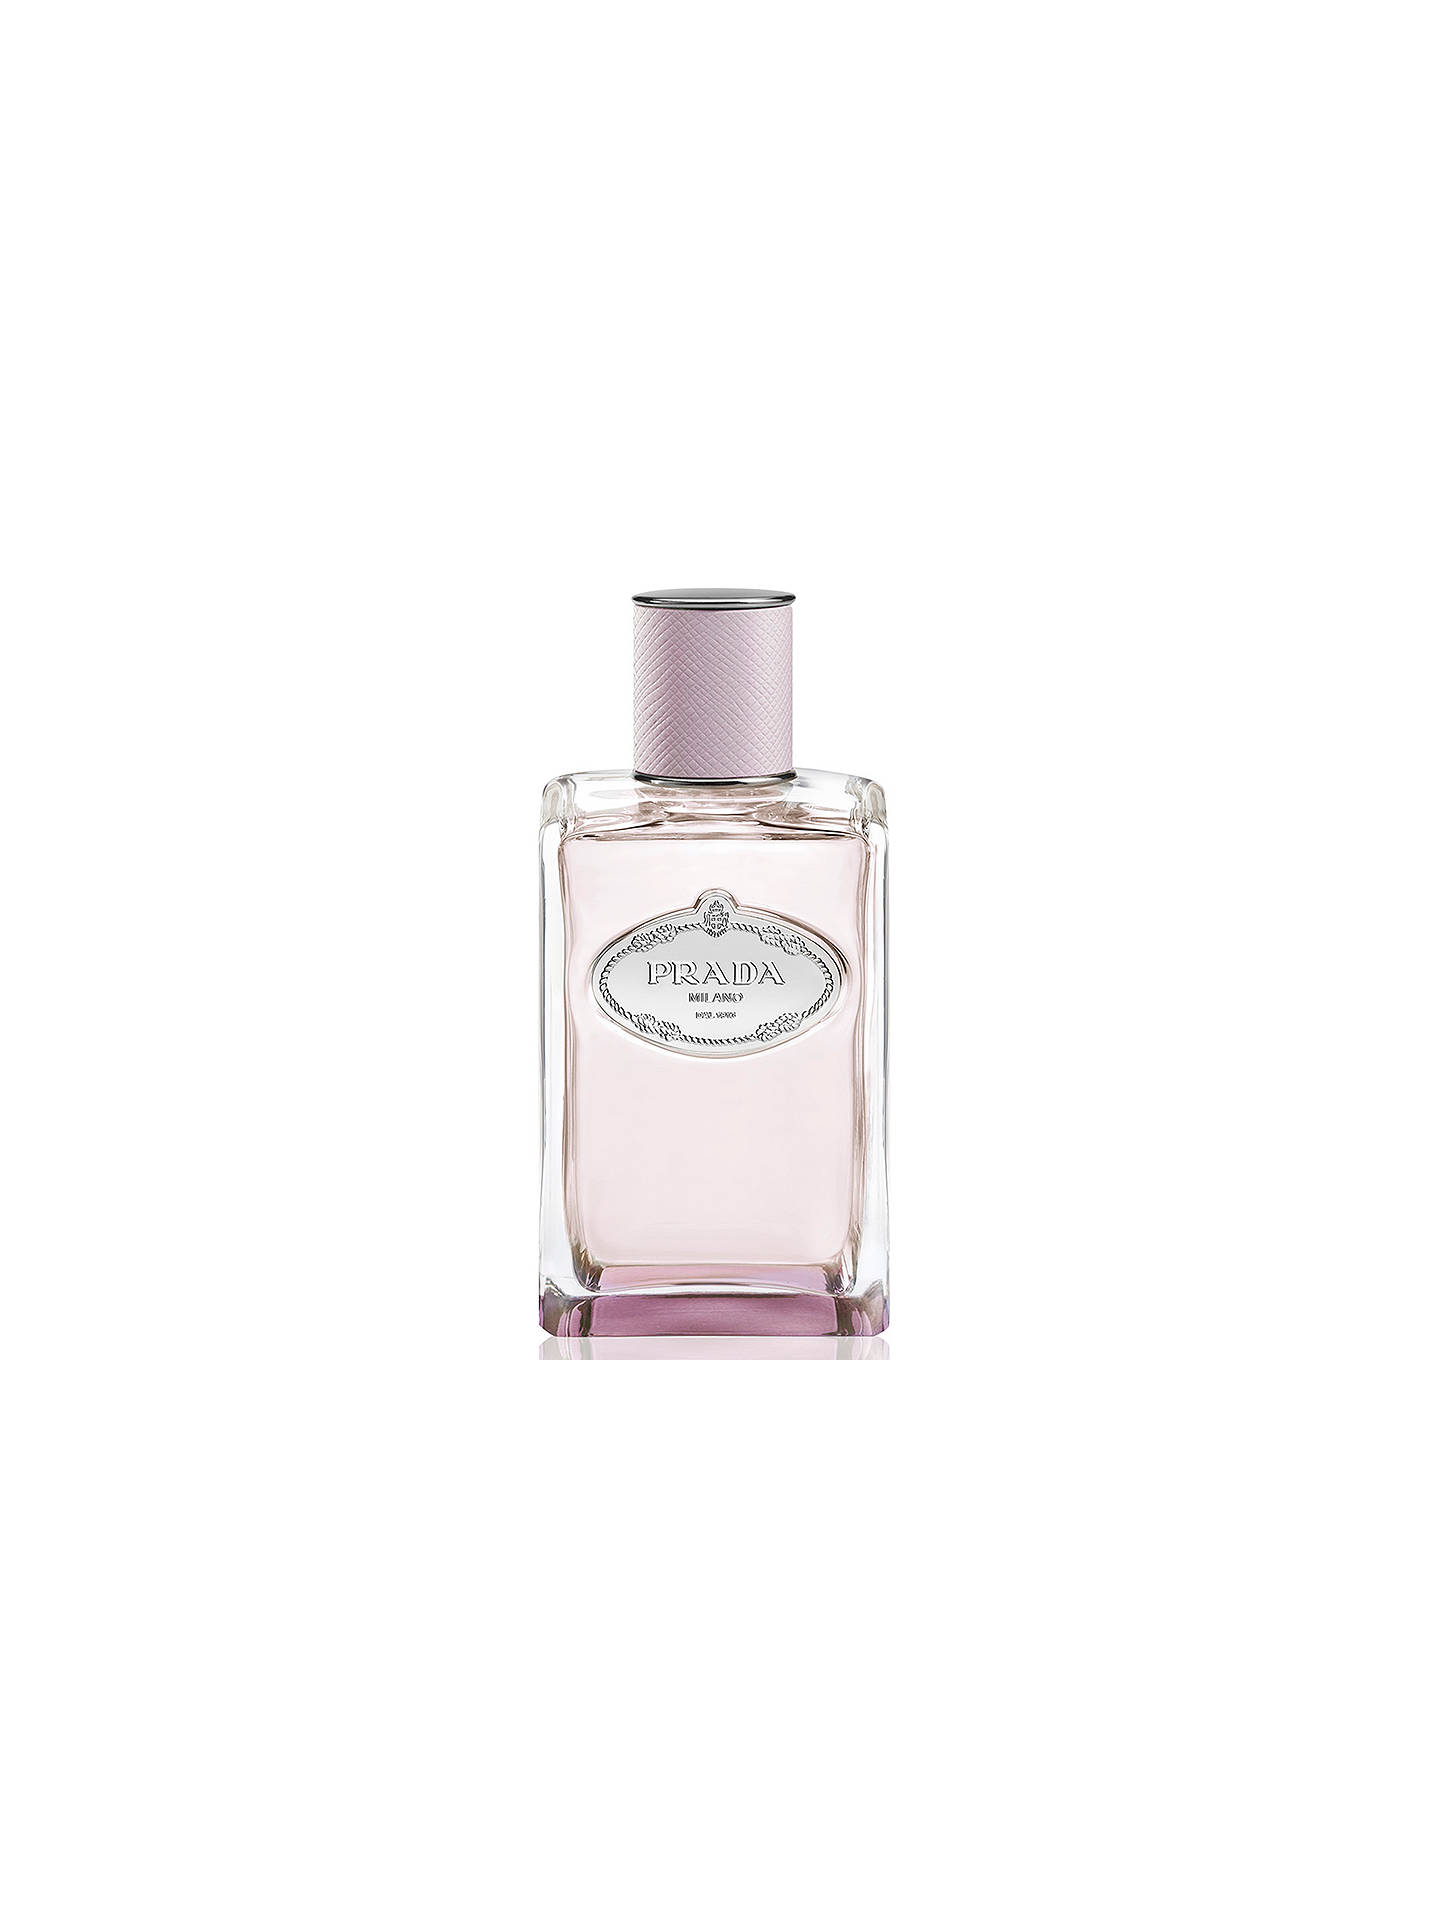 Infusions De Eau Prada Parfum100ml Les Oeillet 1u3TFJlKc